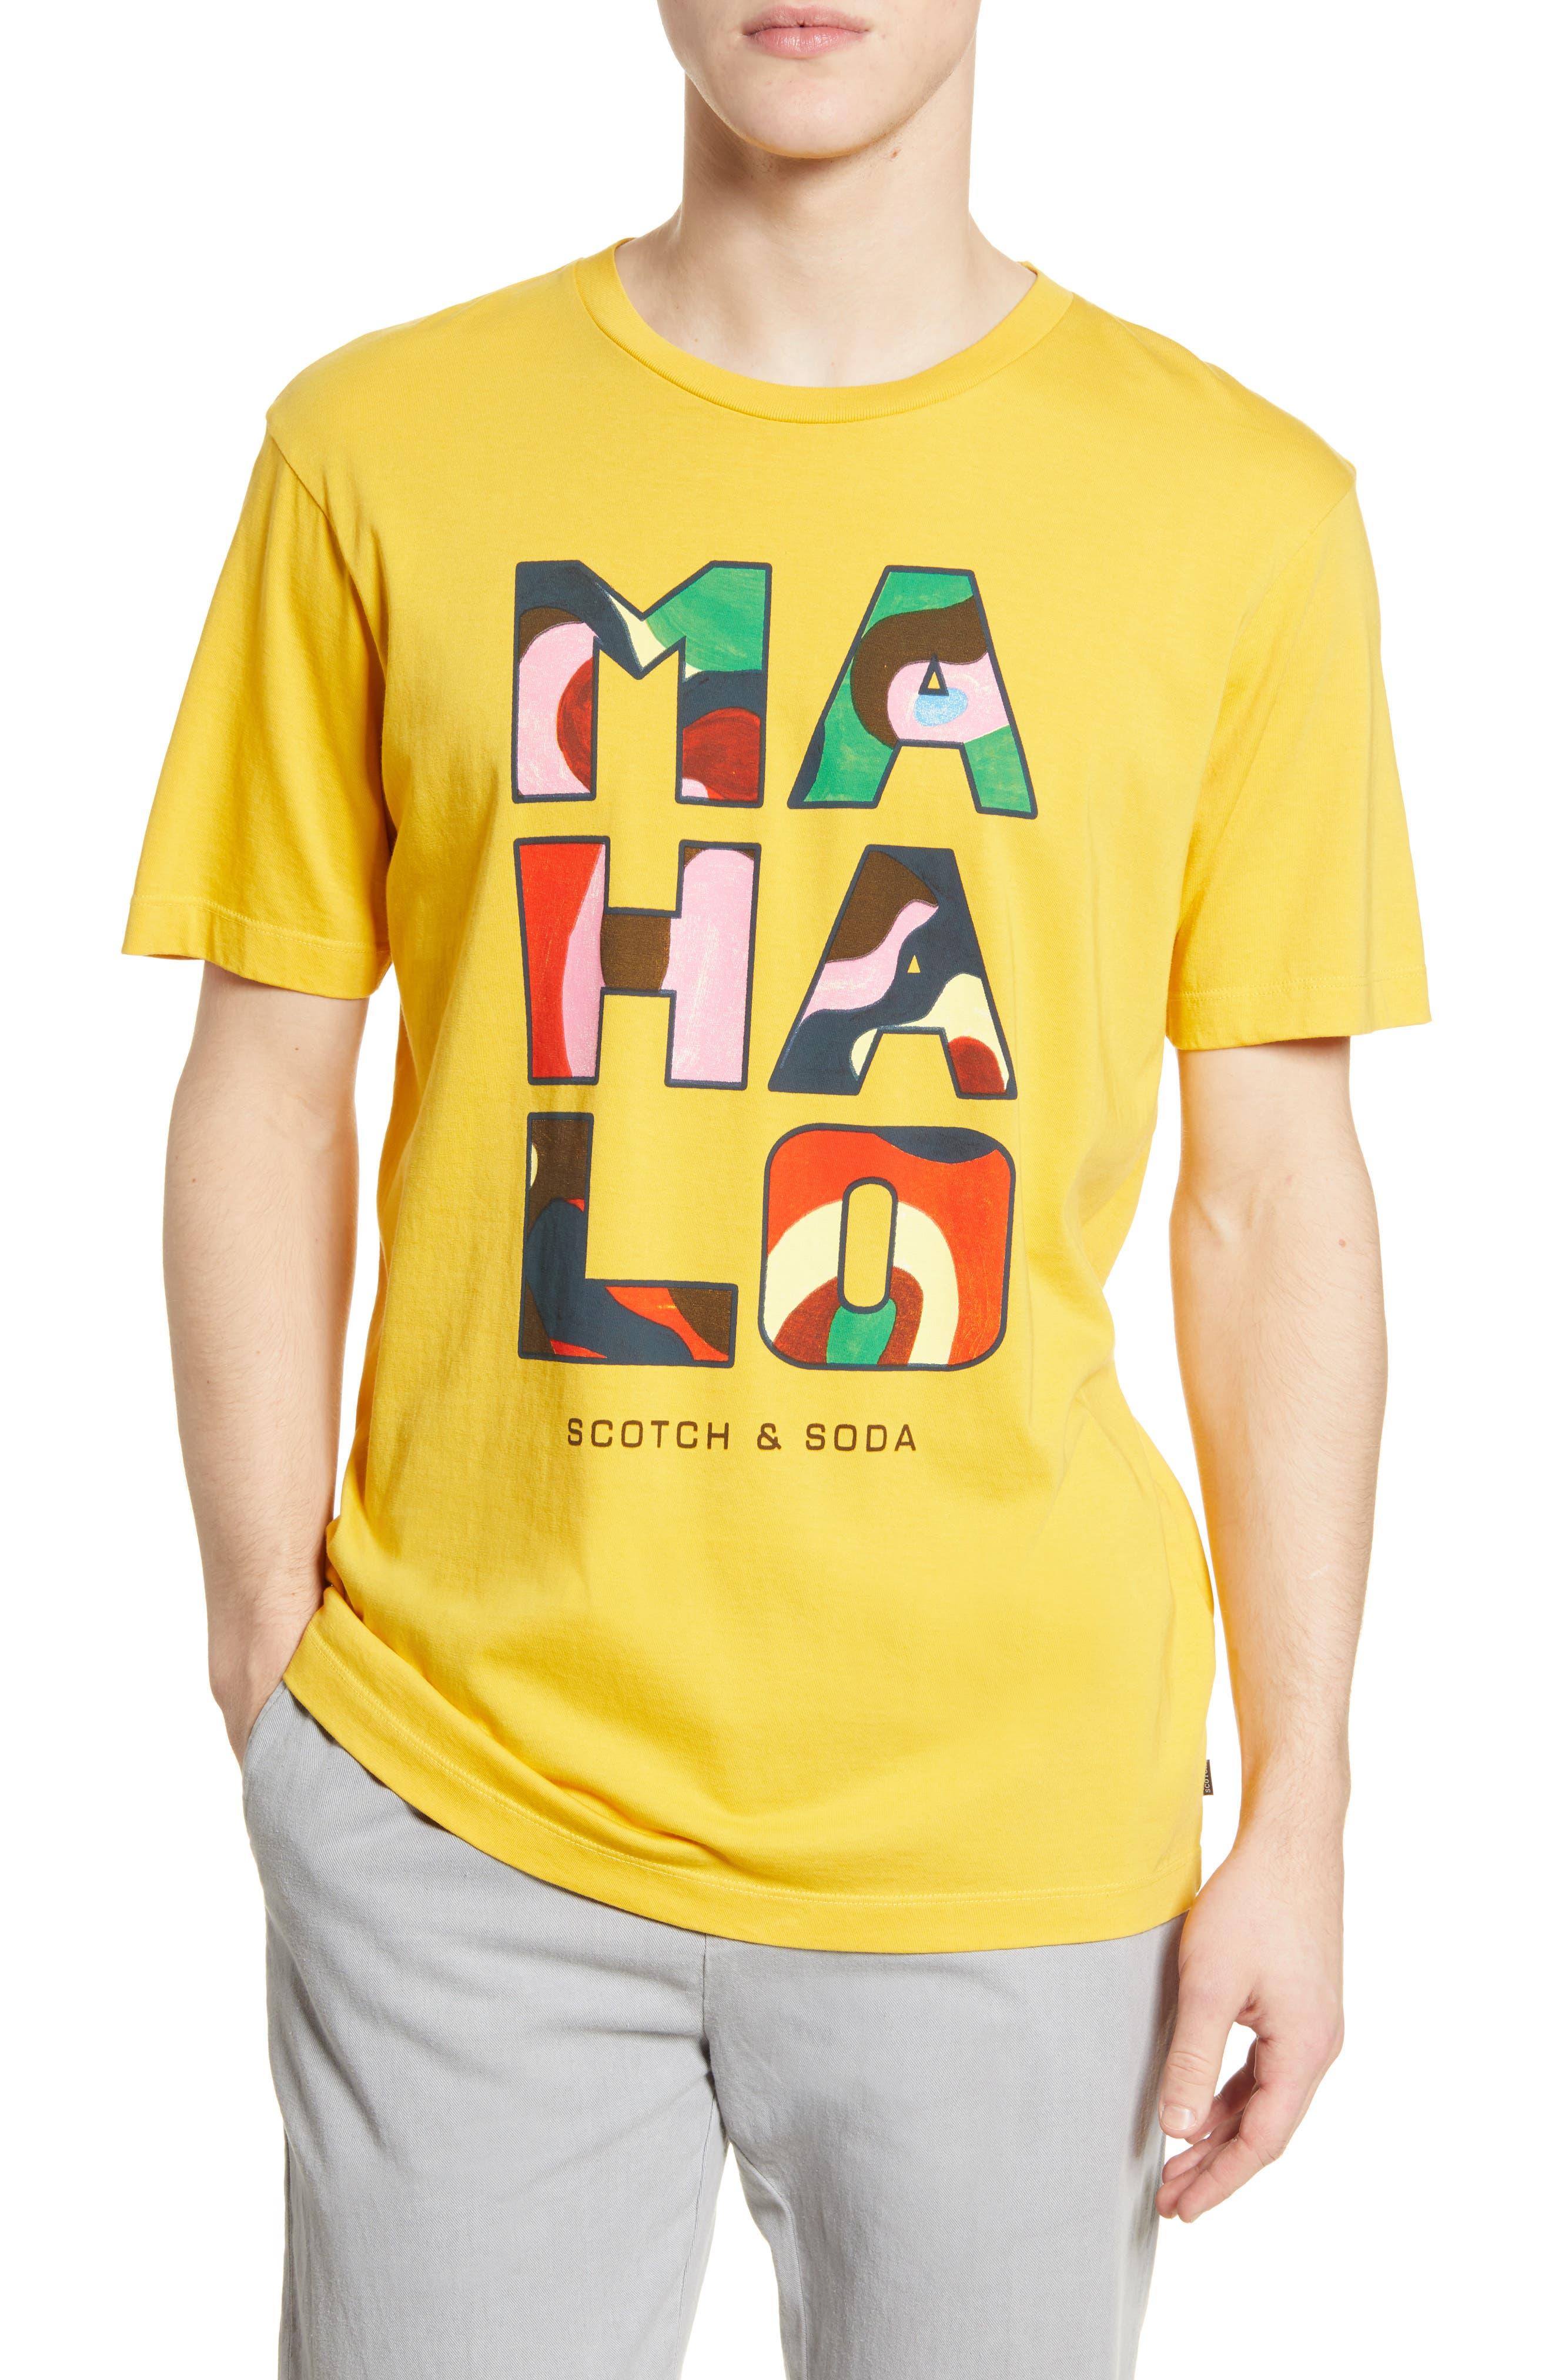 Scotch & Soda Hawaii Artwork Graphic T-shirt In 3501-ochre Spice